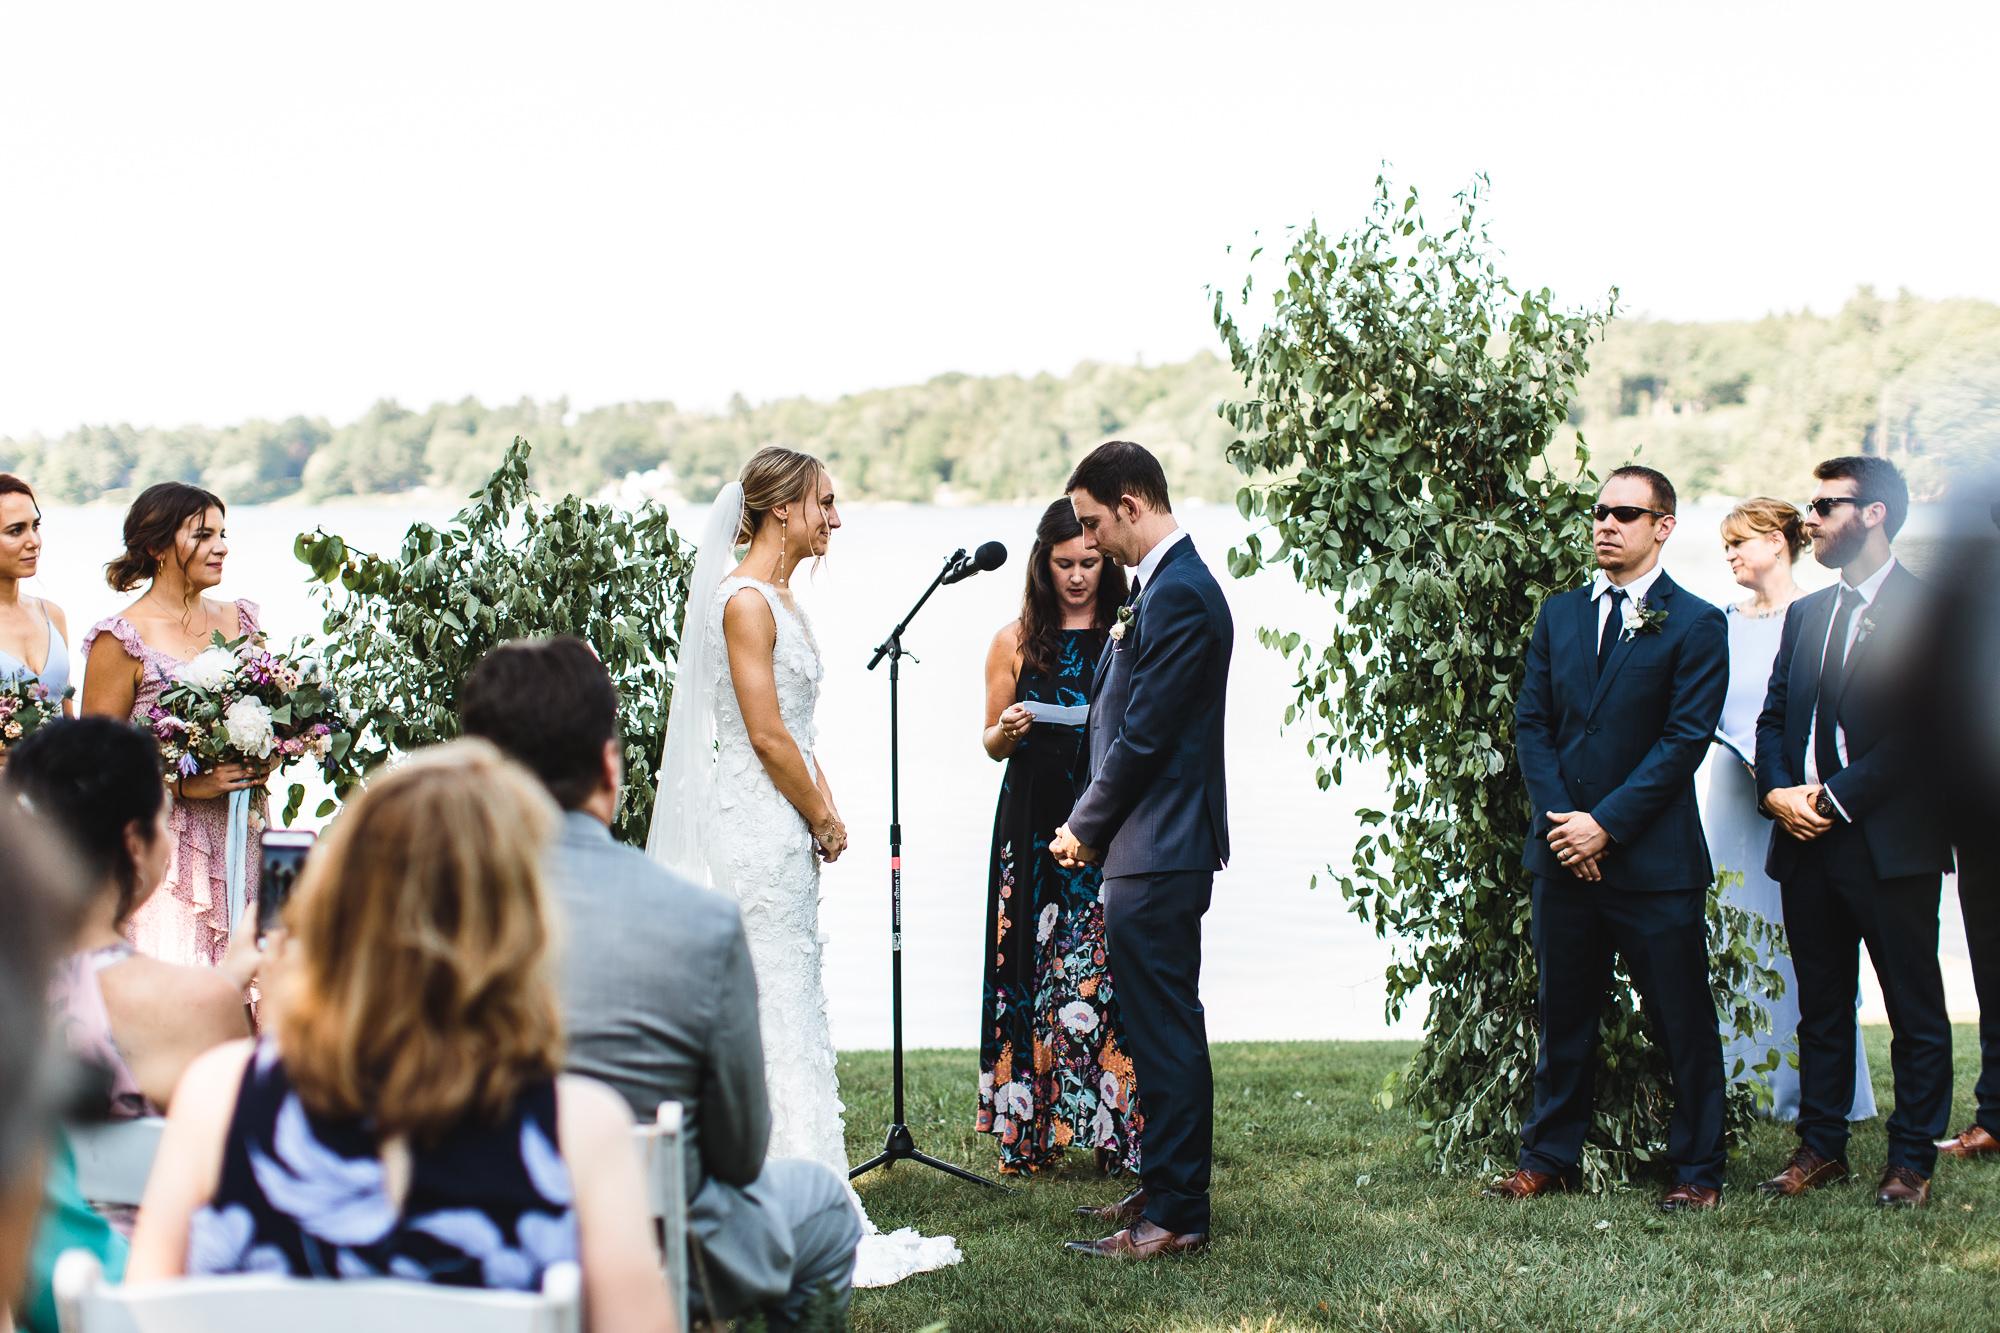 connecticut-summer-lake-wedding-emily-kirke-photography-upstyle (91 of 181).jpg